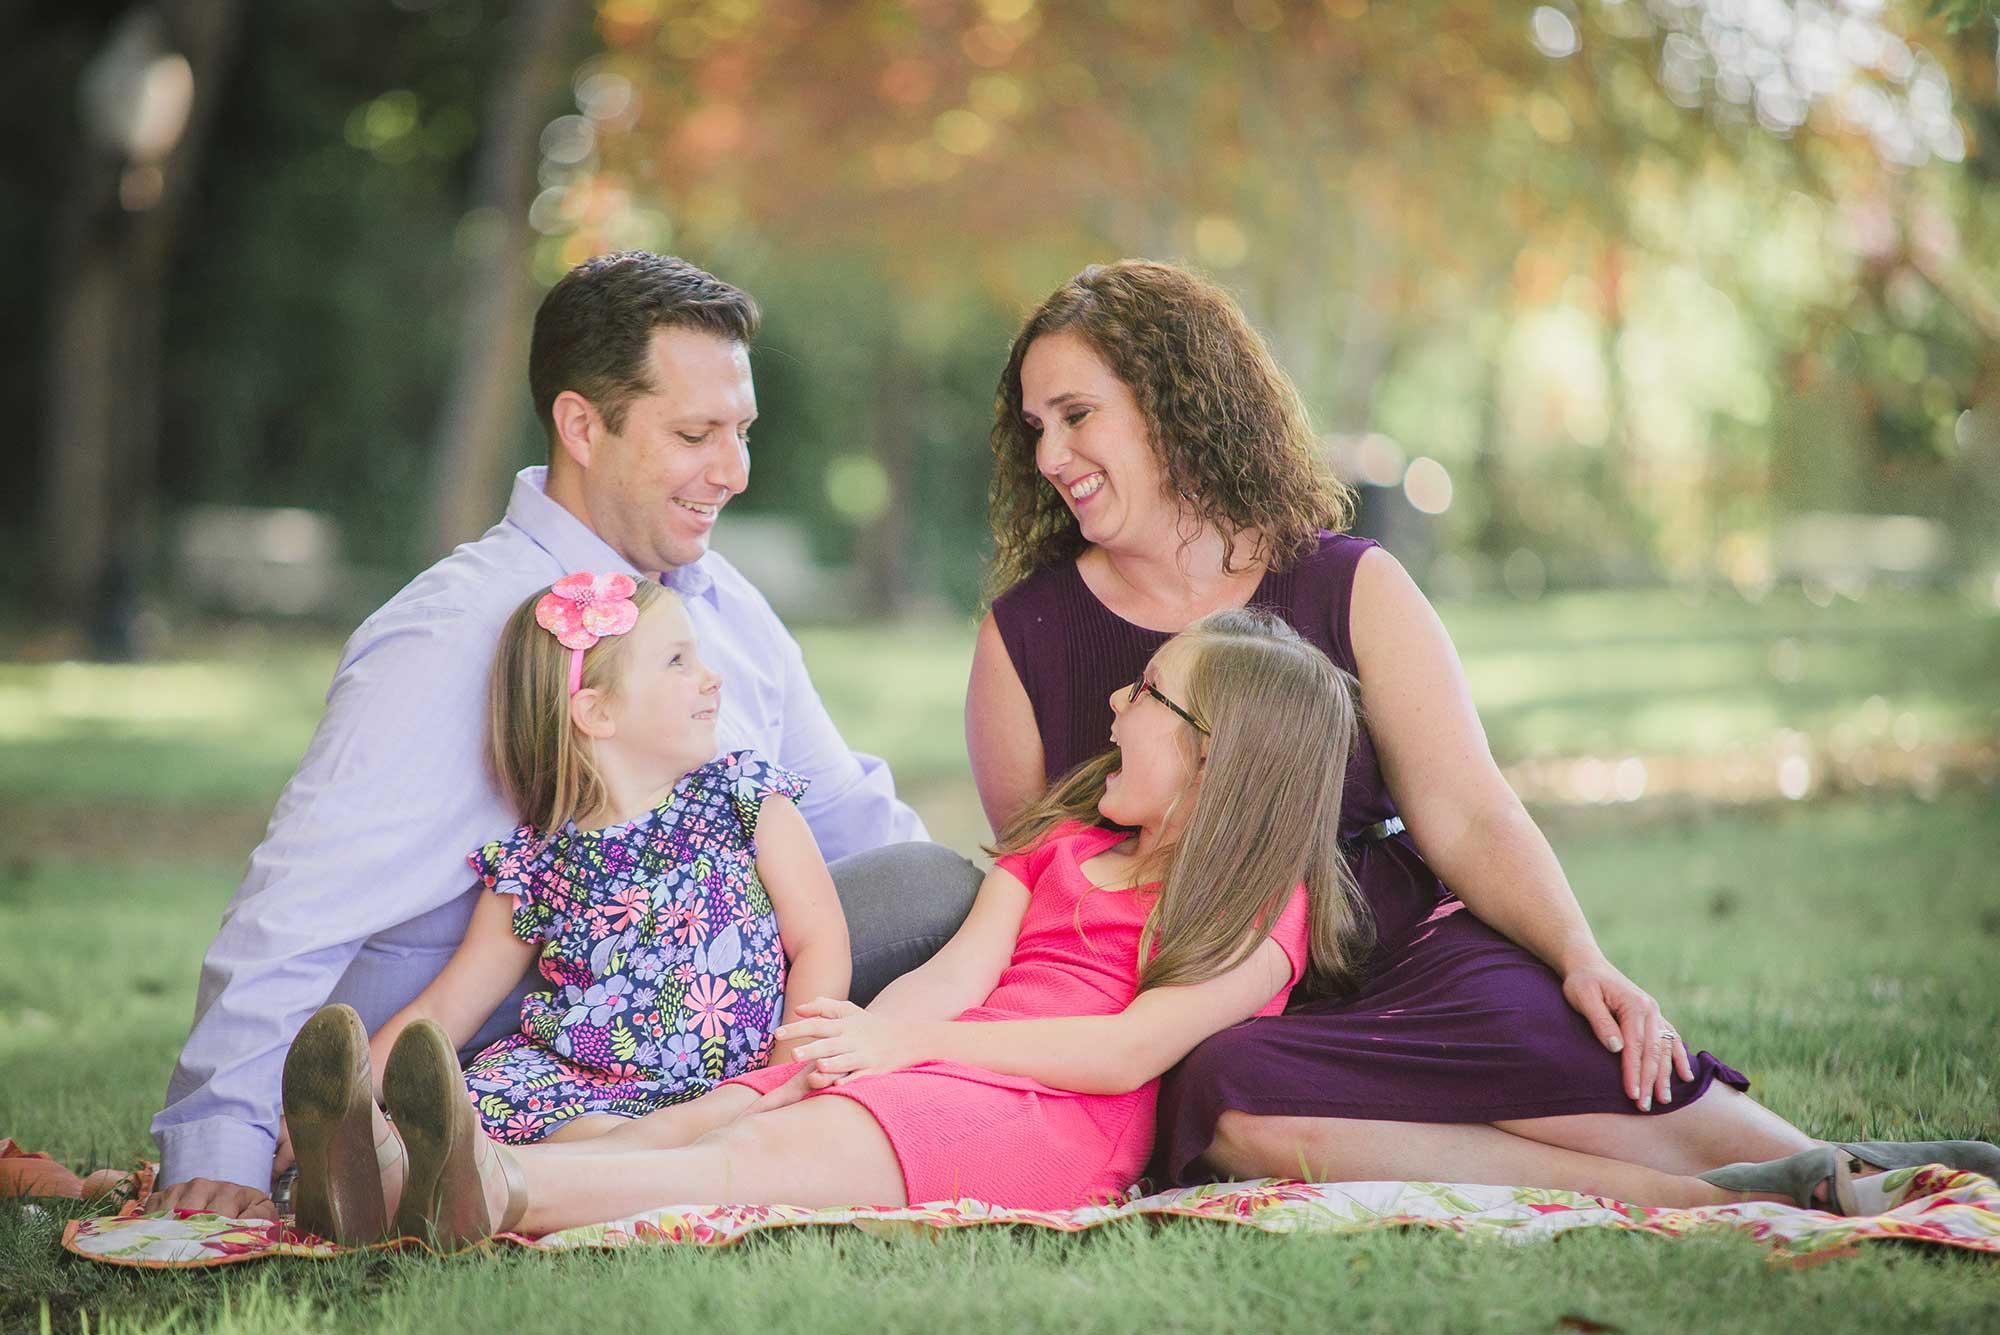 Ed hernandez and family